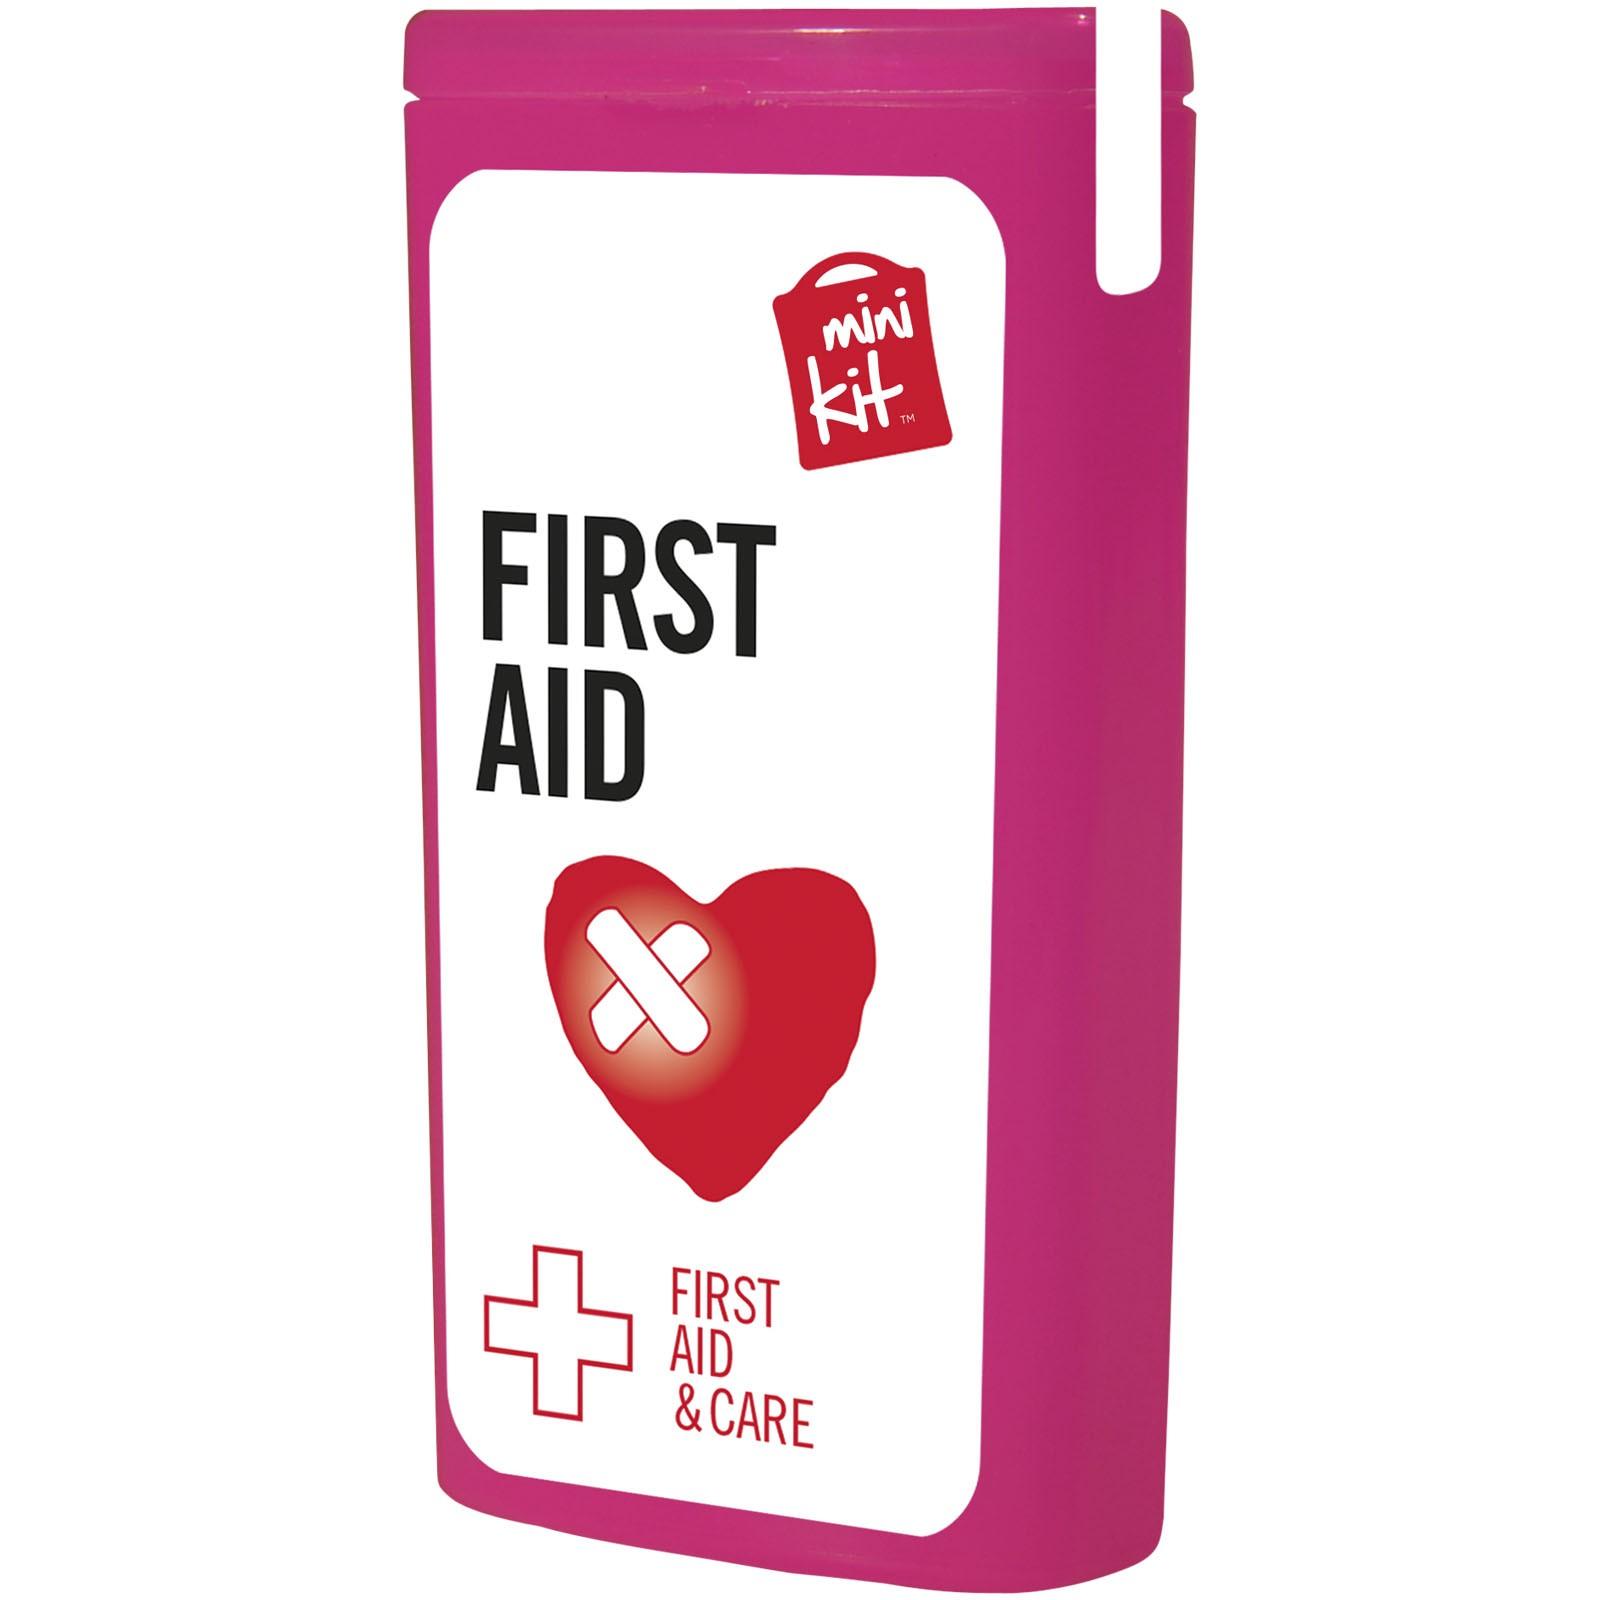 MiniKit First Aid - Magenta